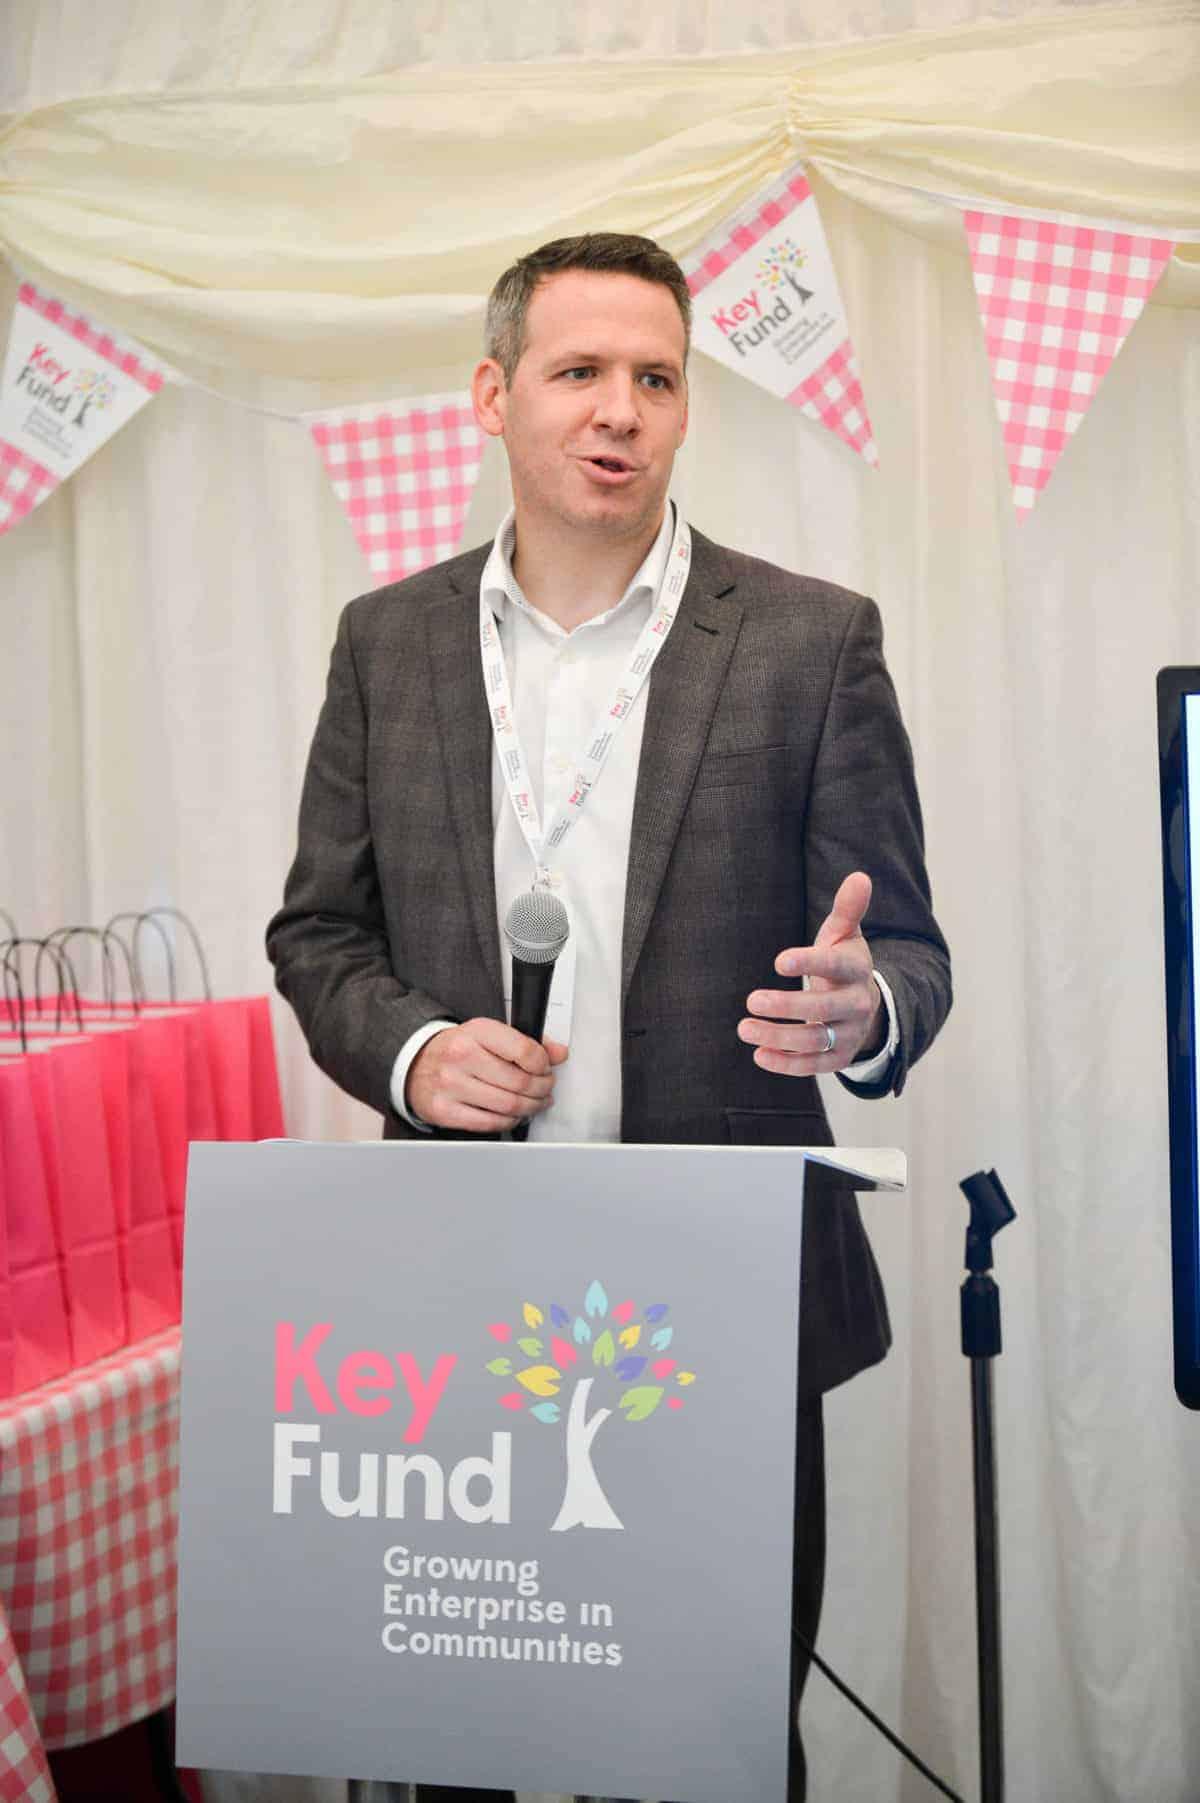 Social Enterprise, The Key Fund